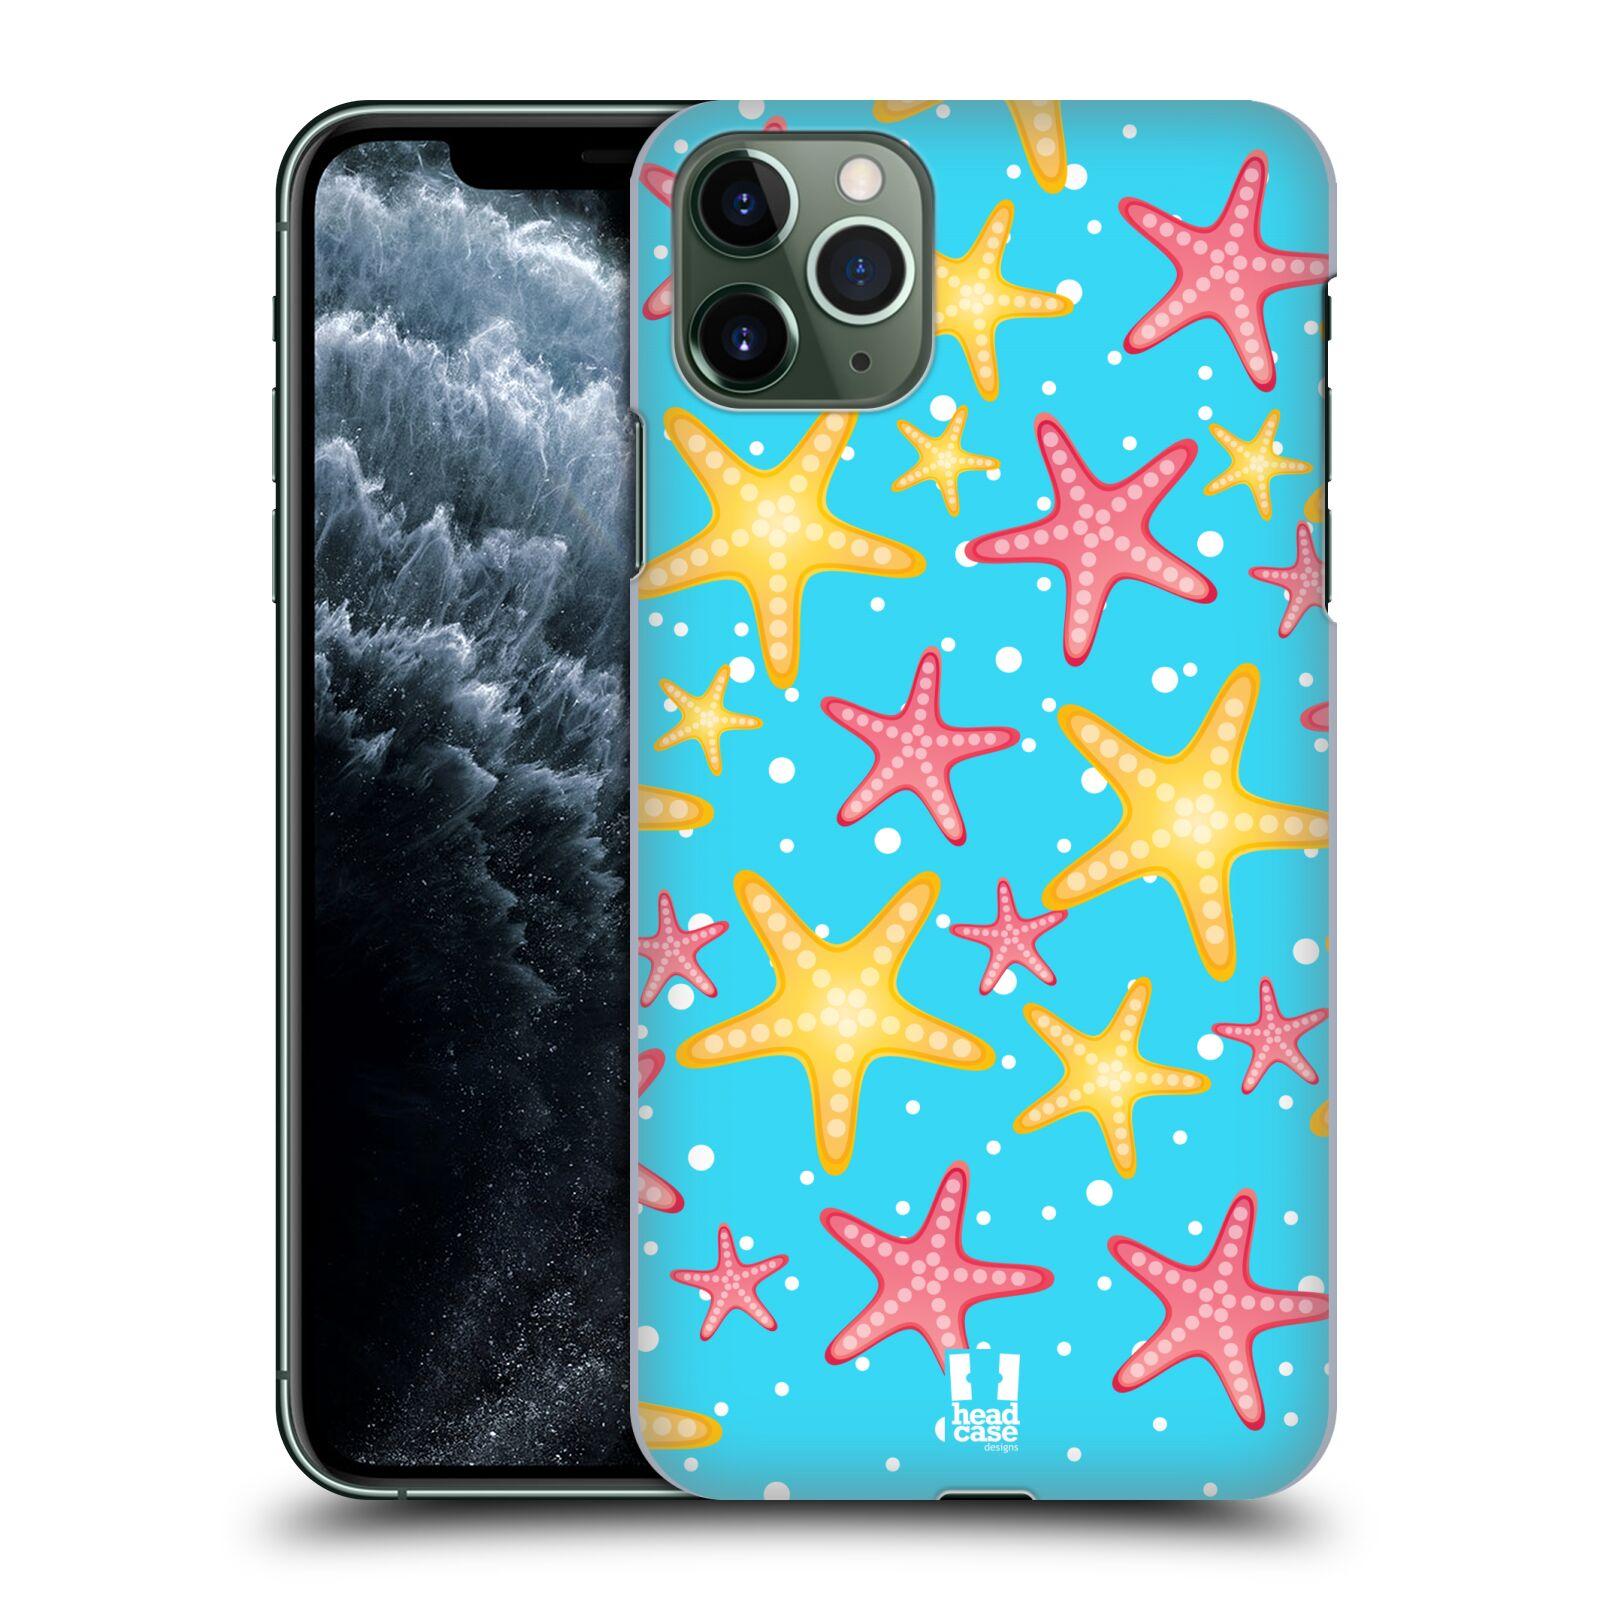 Pouzdro na mobil Apple Iphone 11 PRO MAX - HEAD CASE - vzor mořský živočich hvězda